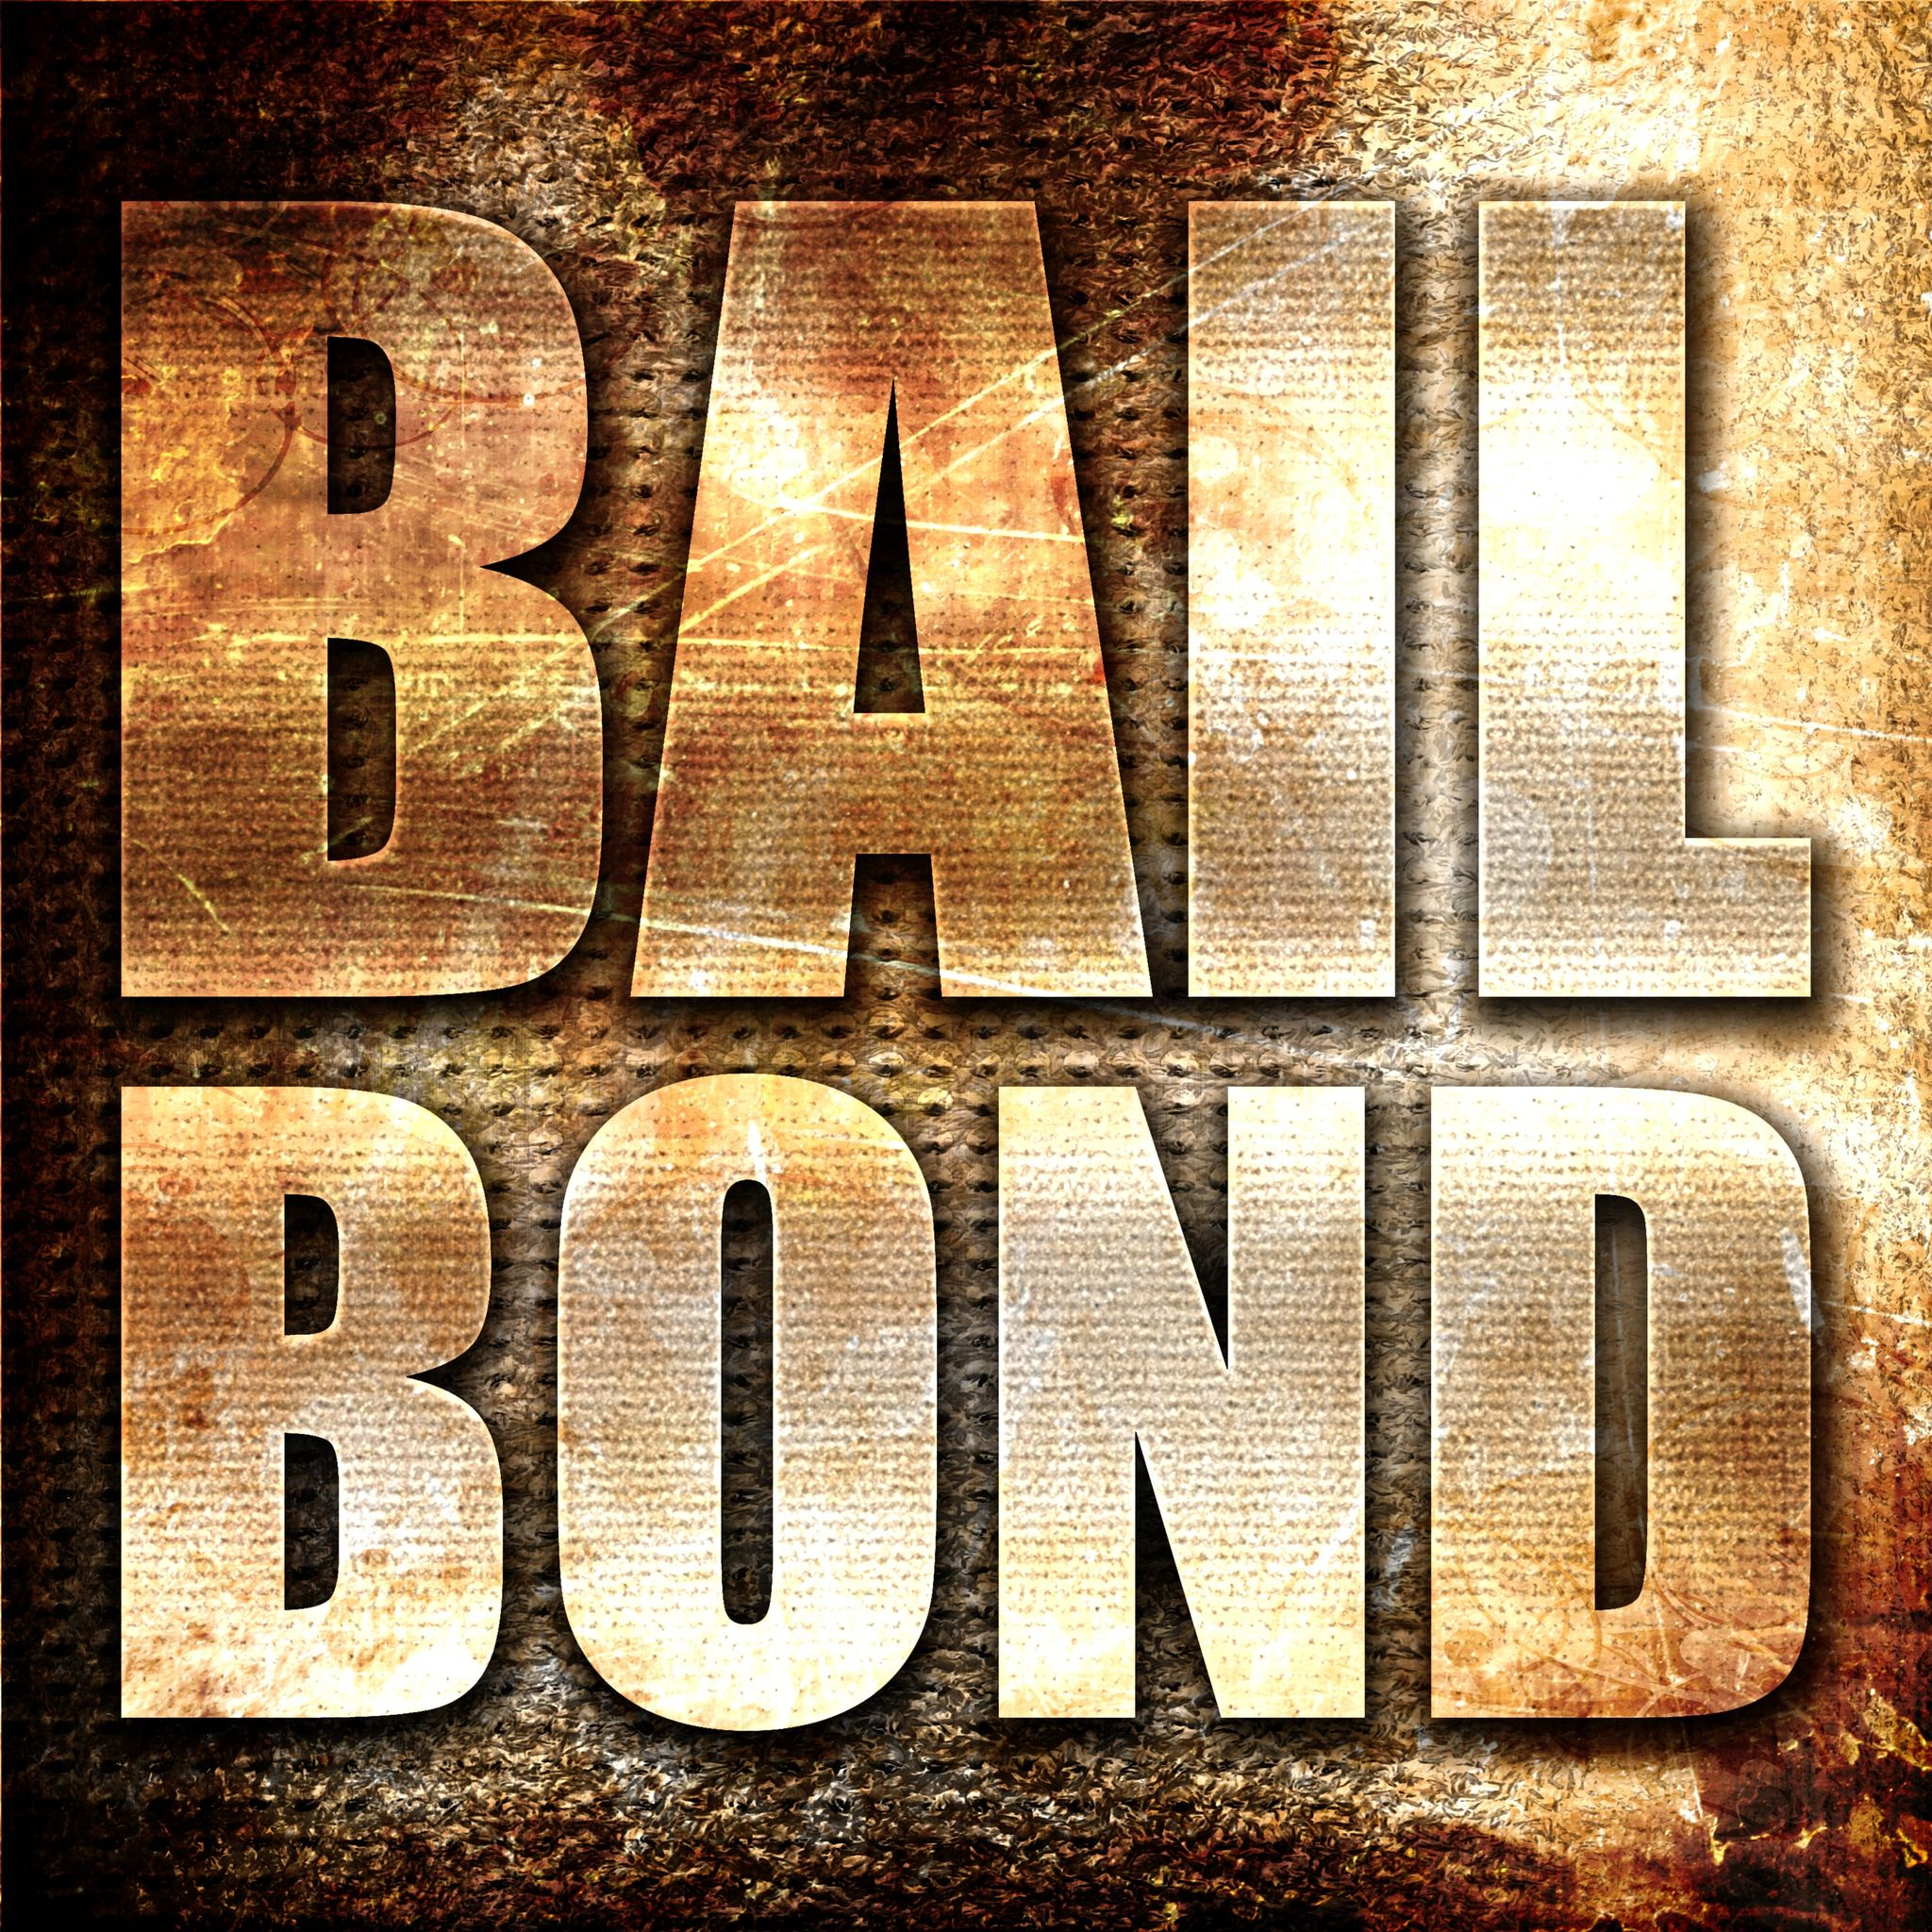 bailbond, 3D rendering, metal text on rust background